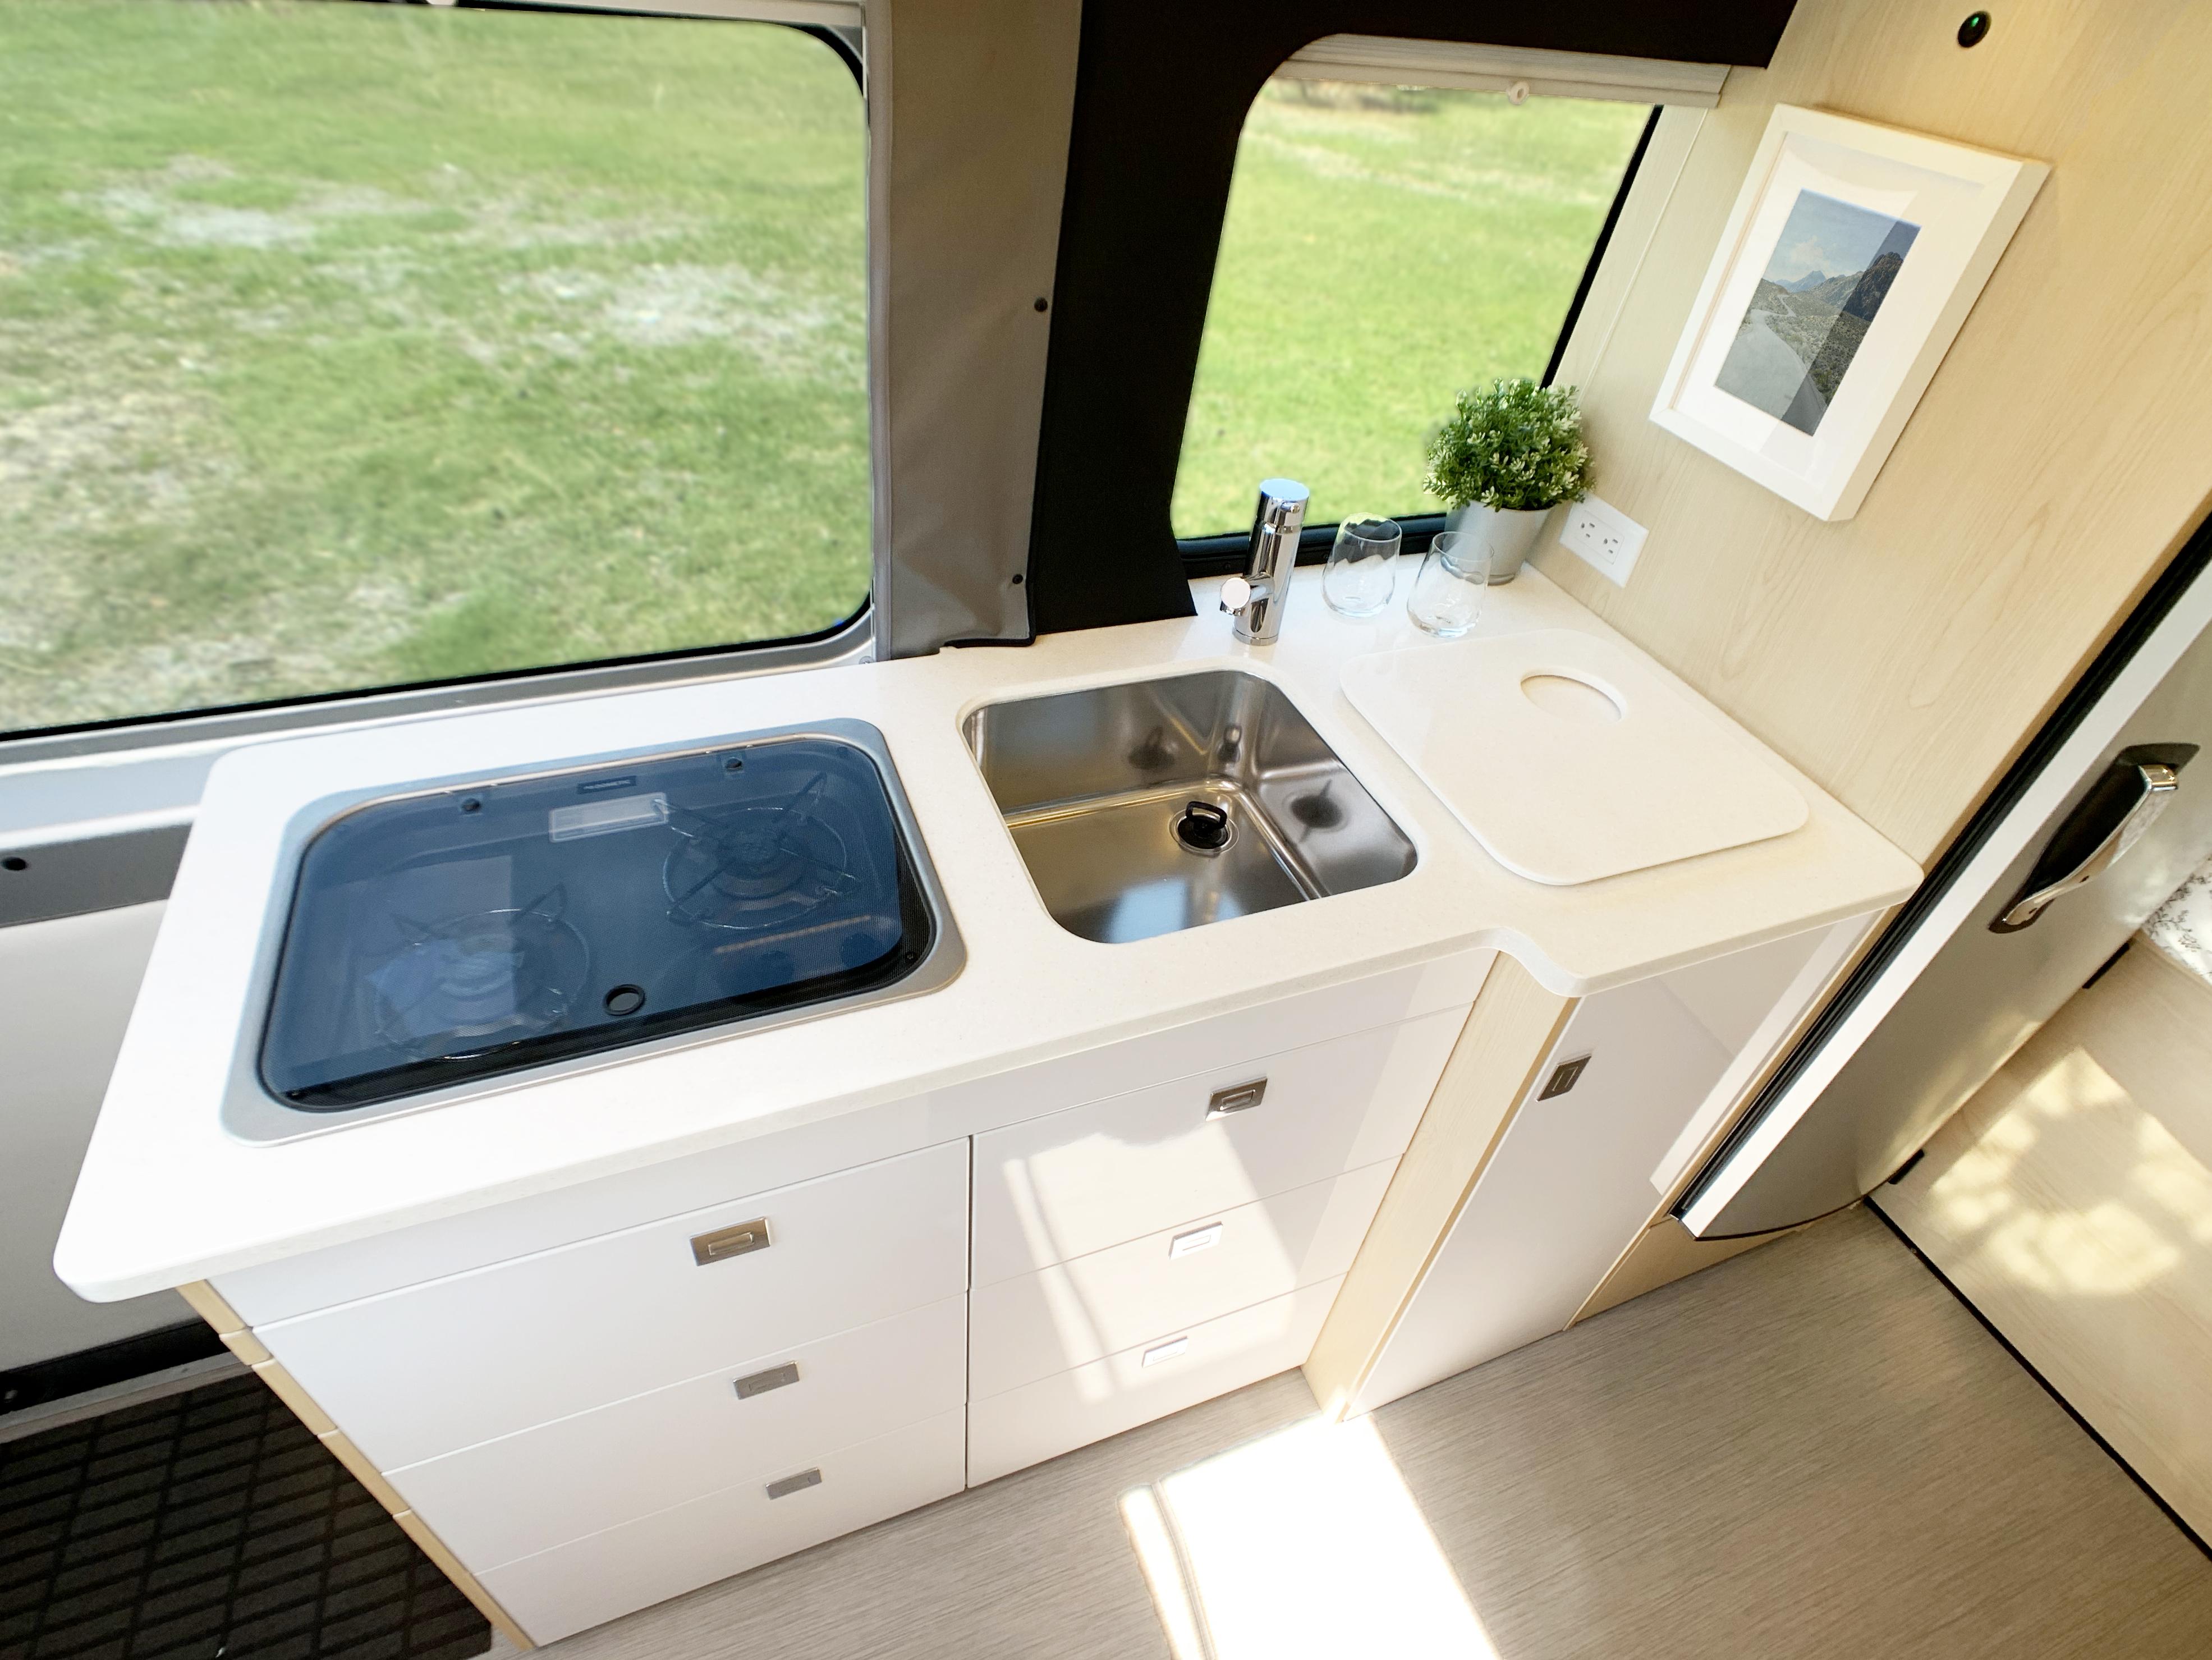 Panoramic RV - Equipped kitchen 1